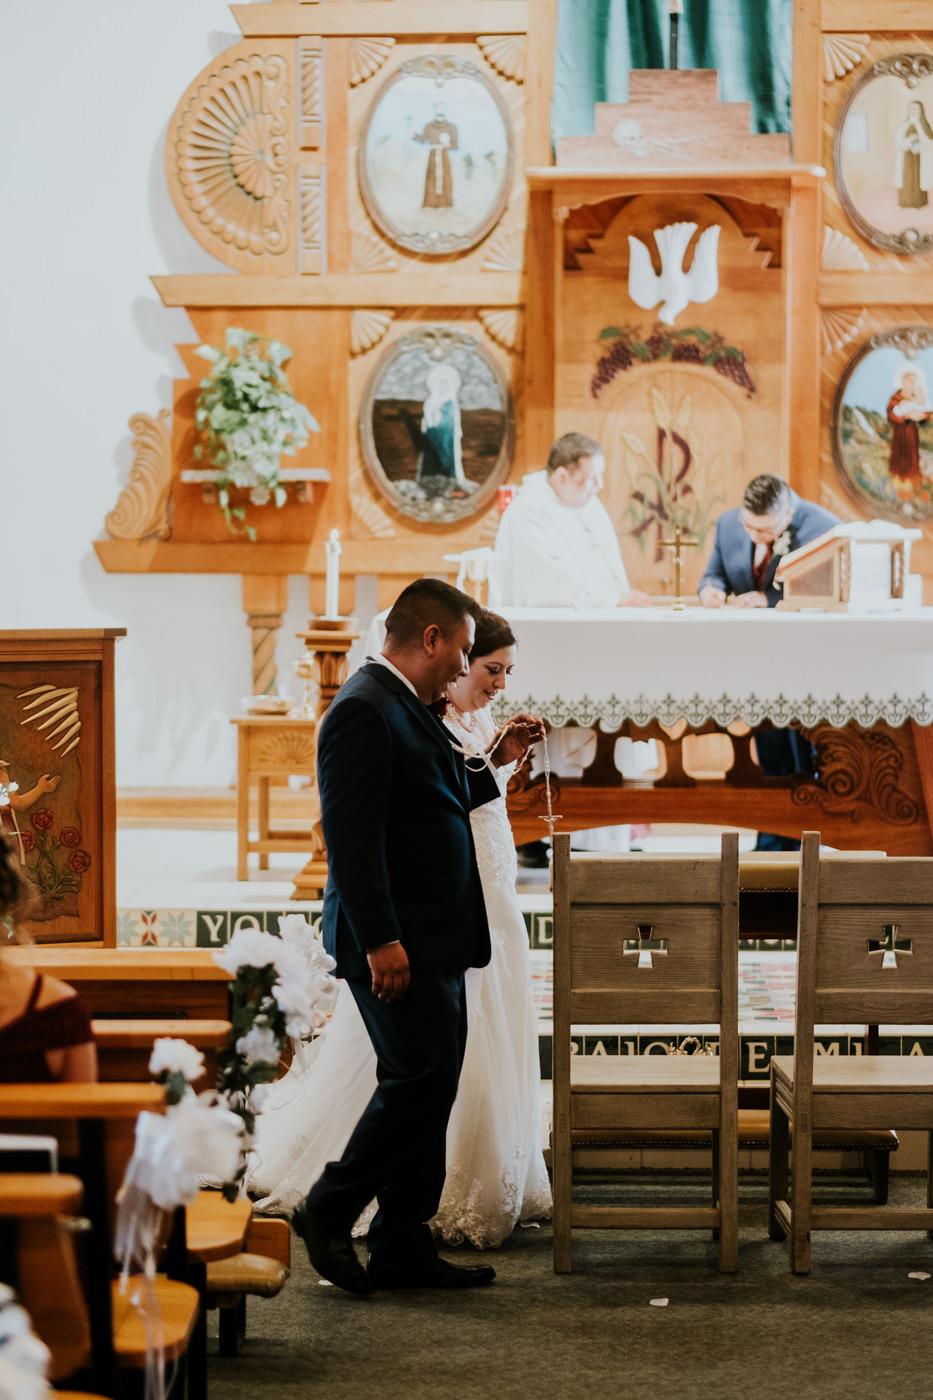 Liza+Gene.Wedding.Blog©mileswittboyer.com2018-78.jpg